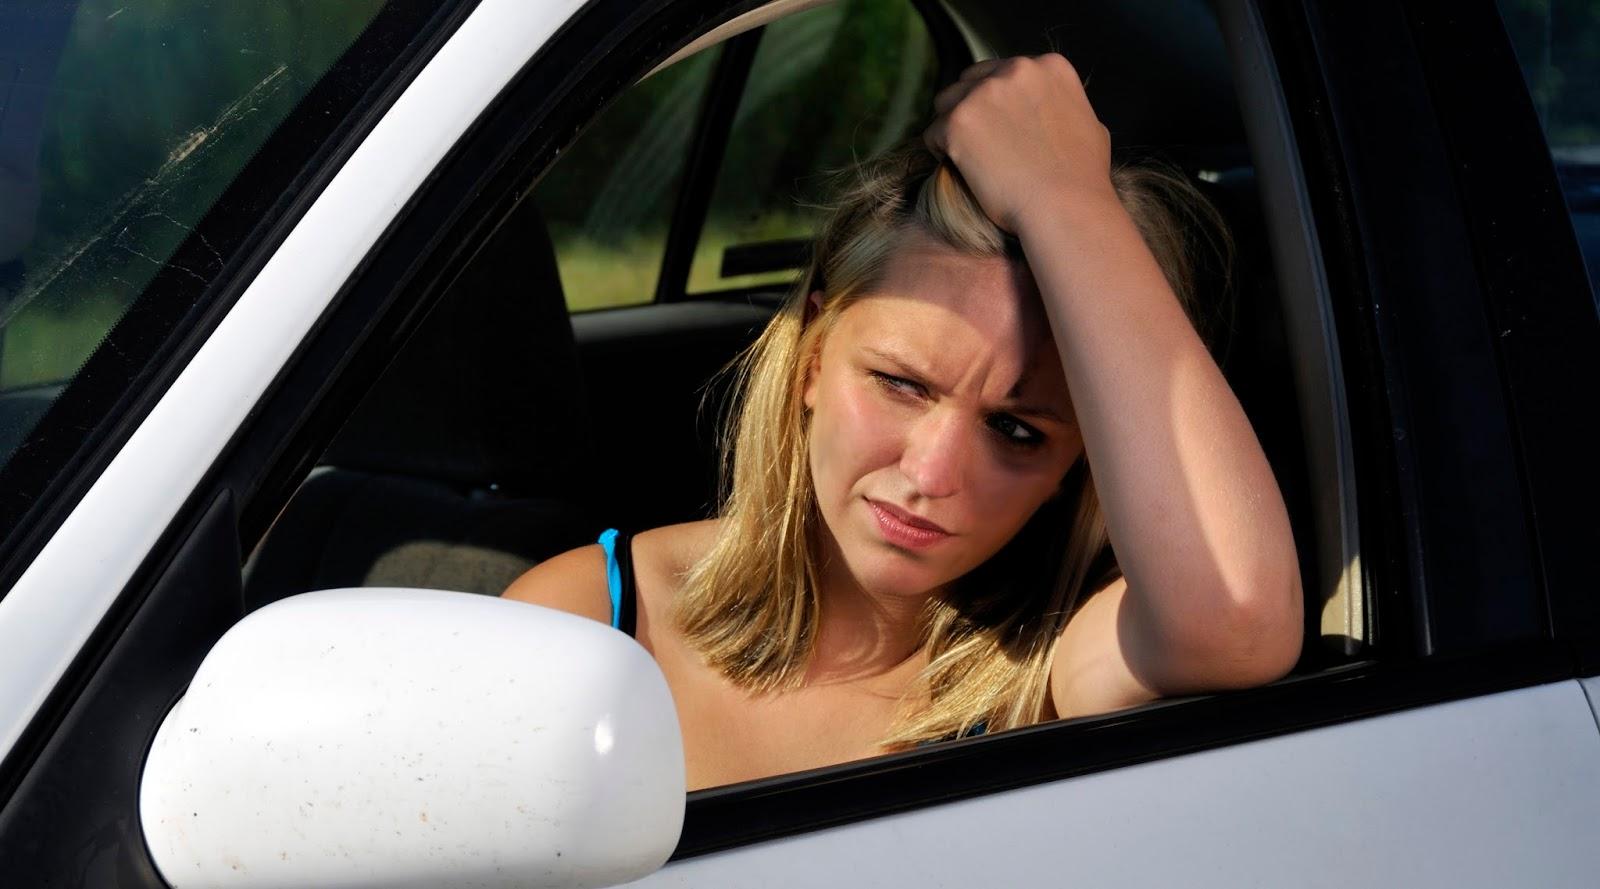 Pengeluaran Tak Terduga yang Kecil Tapi Bikin using 7 Keliling di Tanggal Tua cewek cantik di atas mobil